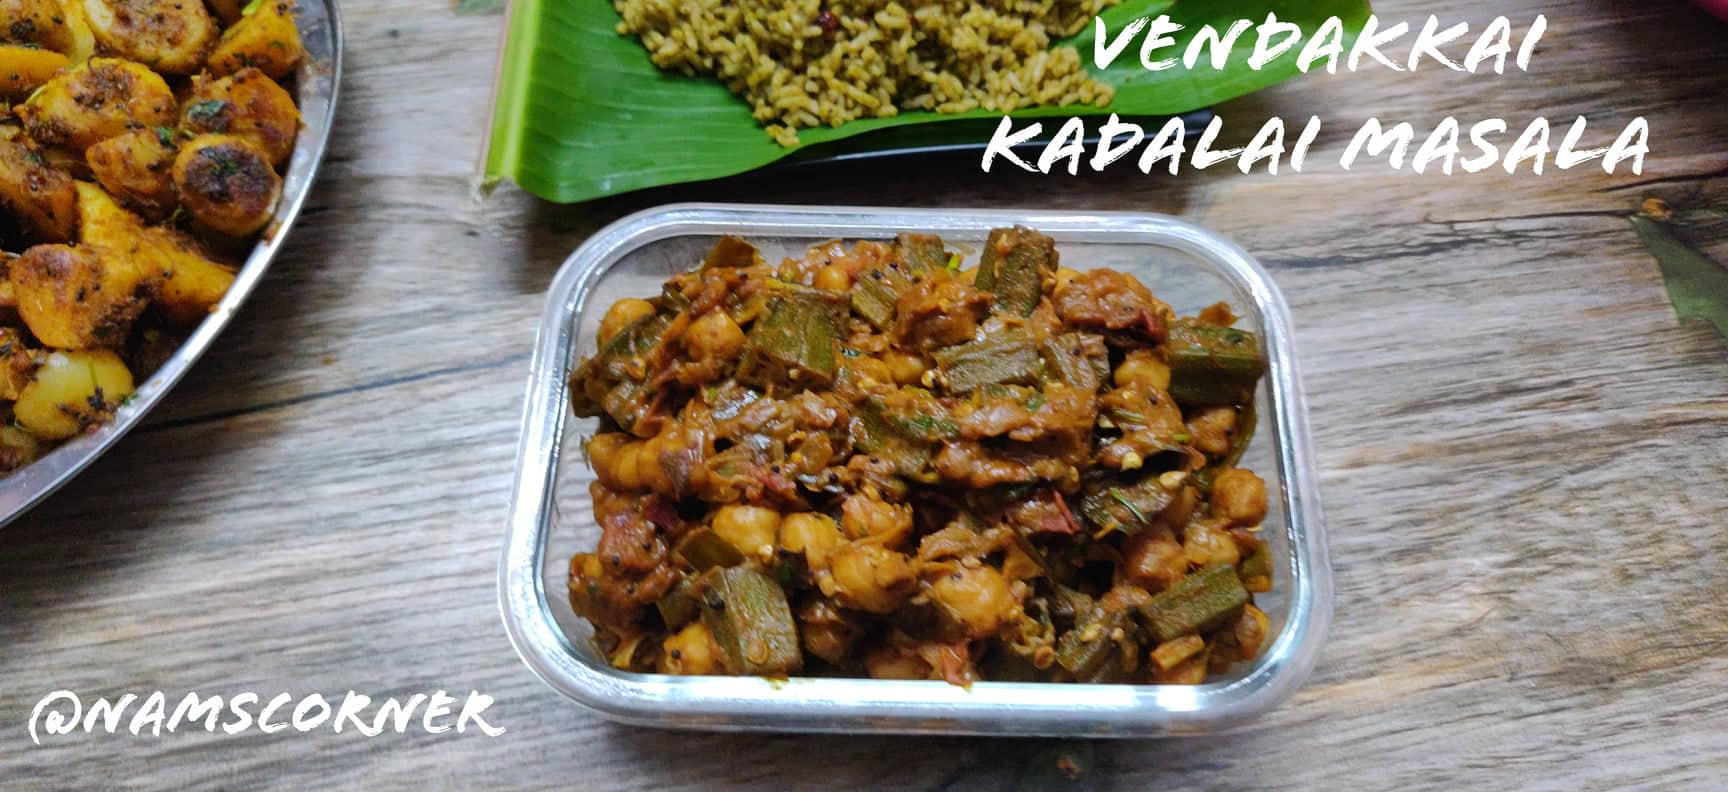 Vendakkai Kadalai Masala Recipe | Lady's finger chana masala